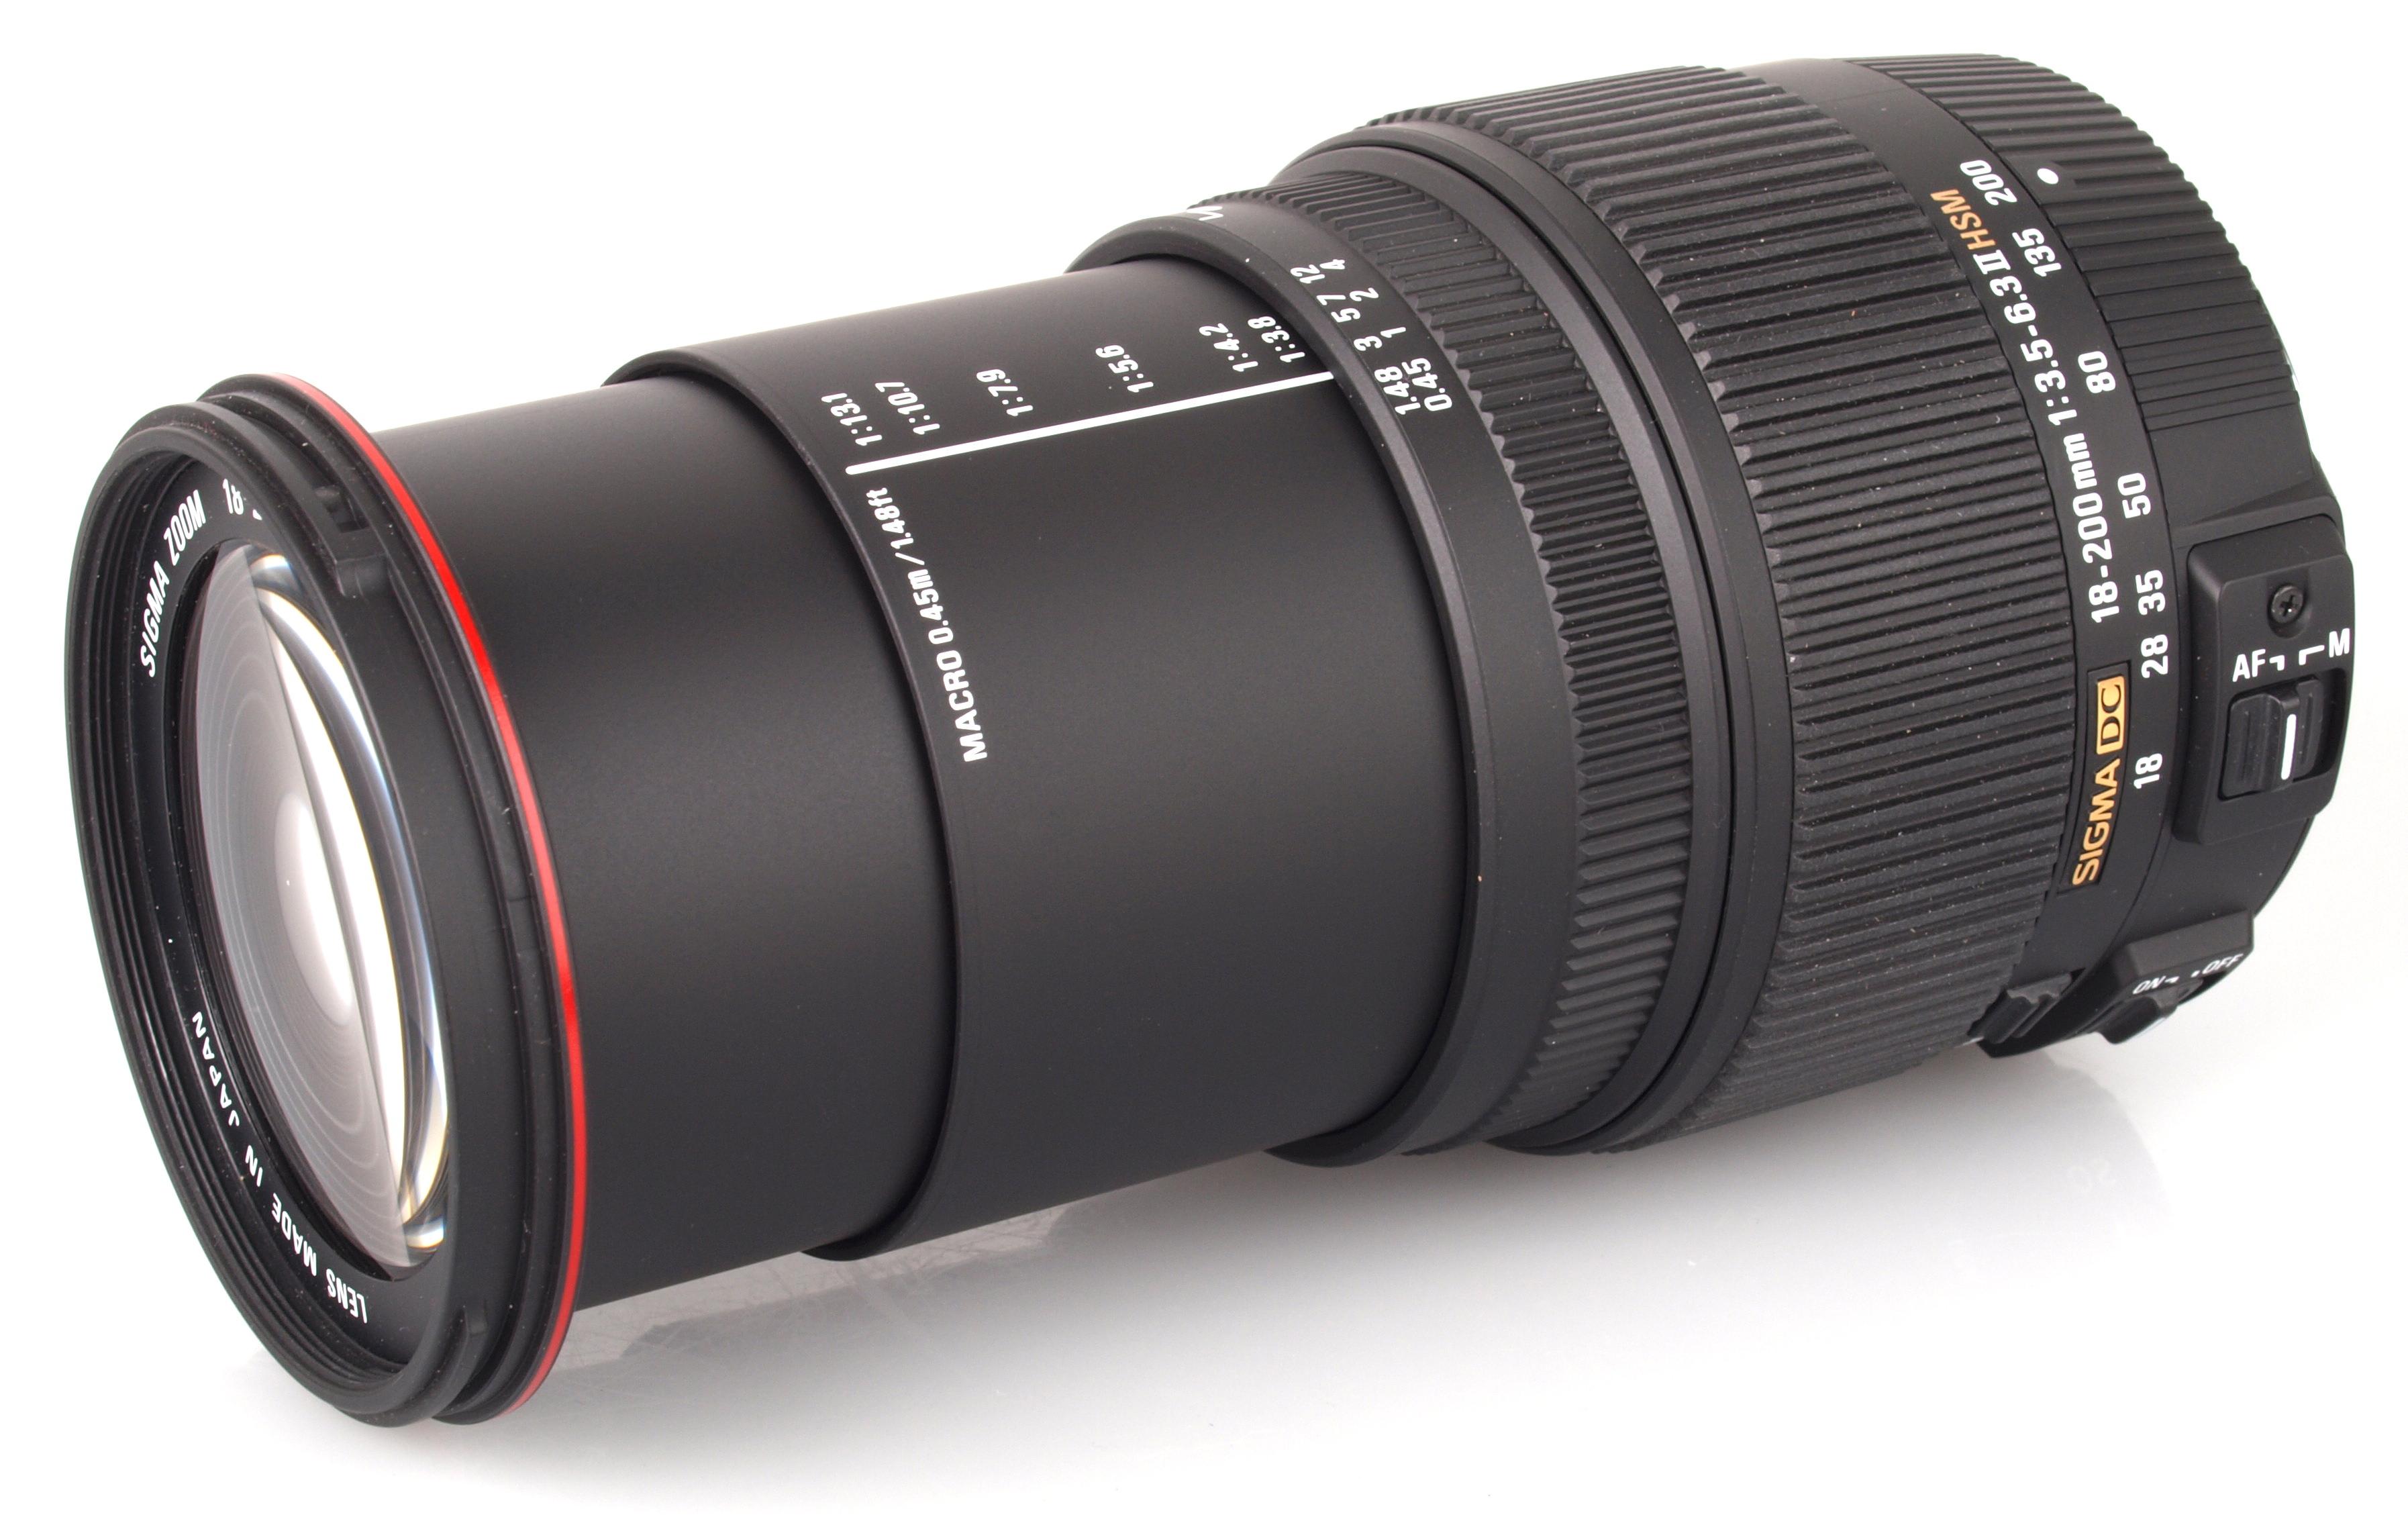 Sigma 18-200mm f/3.5-6.3 DC Macro OS HSM C Lens Review